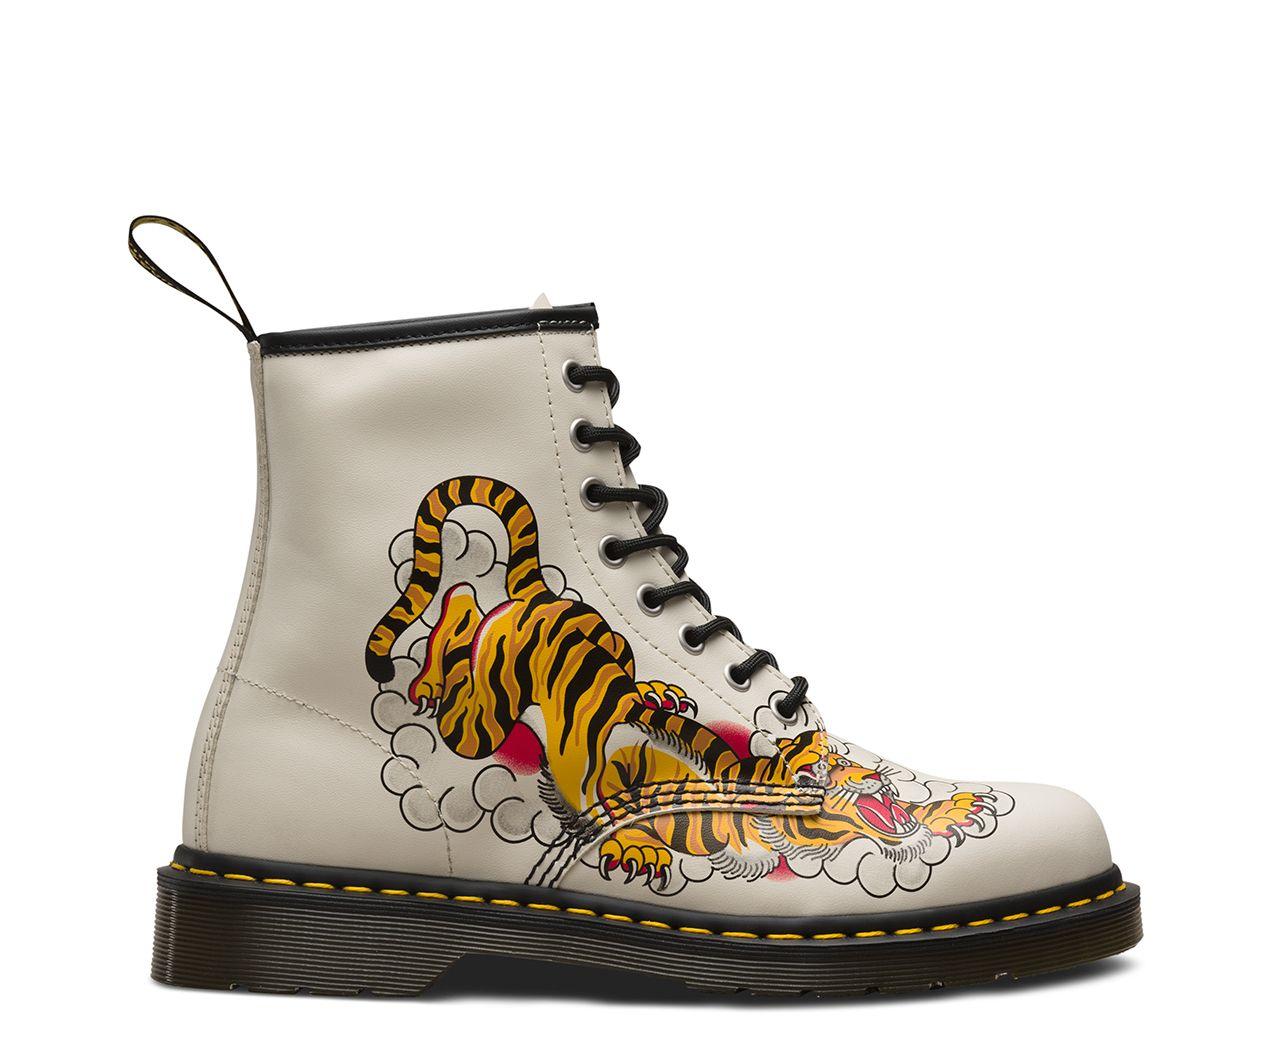 ba6782bb1e3 Dr martens 1460 tattoo grez in 2019   aiyana   Doc martens boots, Doc  martins boots, Doc martens outfit